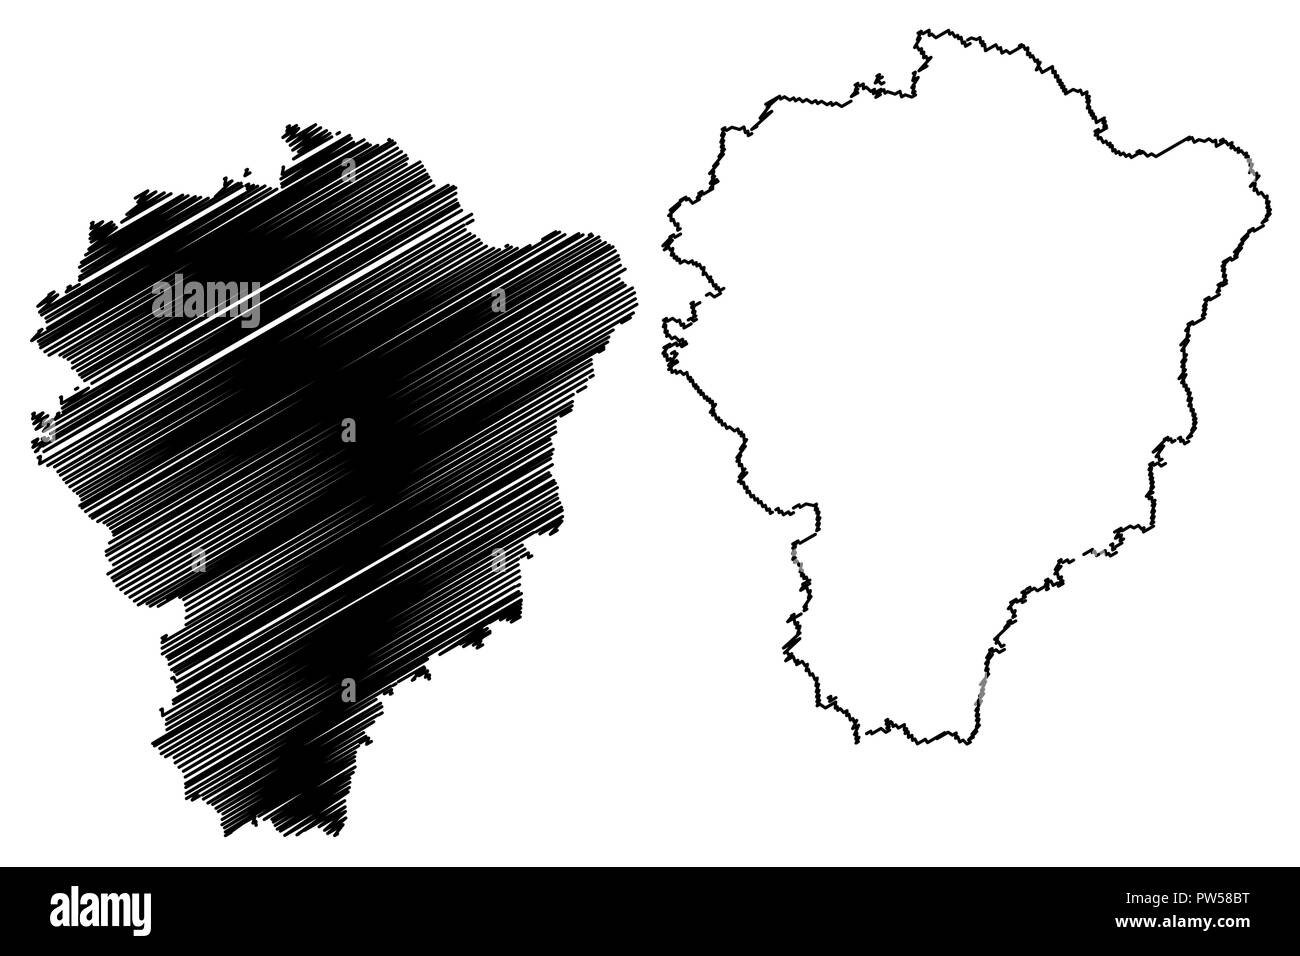 Yaroslavl Oblast (Russia, Subjects of the Russian Federation ... on elista russia map, tyumen russia map, mandrogi russia map, saint petersburg, yekaterinburg russia map, zagorsk russia map, altai krai russia map, simferopol russia map, astrakhan russia map, severomorsk russia map, sevastopol russia map, samarkand russia map, uglich russia map, tallinn russia map, murmansk russia map, lokomotiv yaroslavl, lake baikal, nizhny novgorod, yurga russia map, tuva russia map, kalmykia russia map, krasnogorsk russia map, sarajevo russia map,